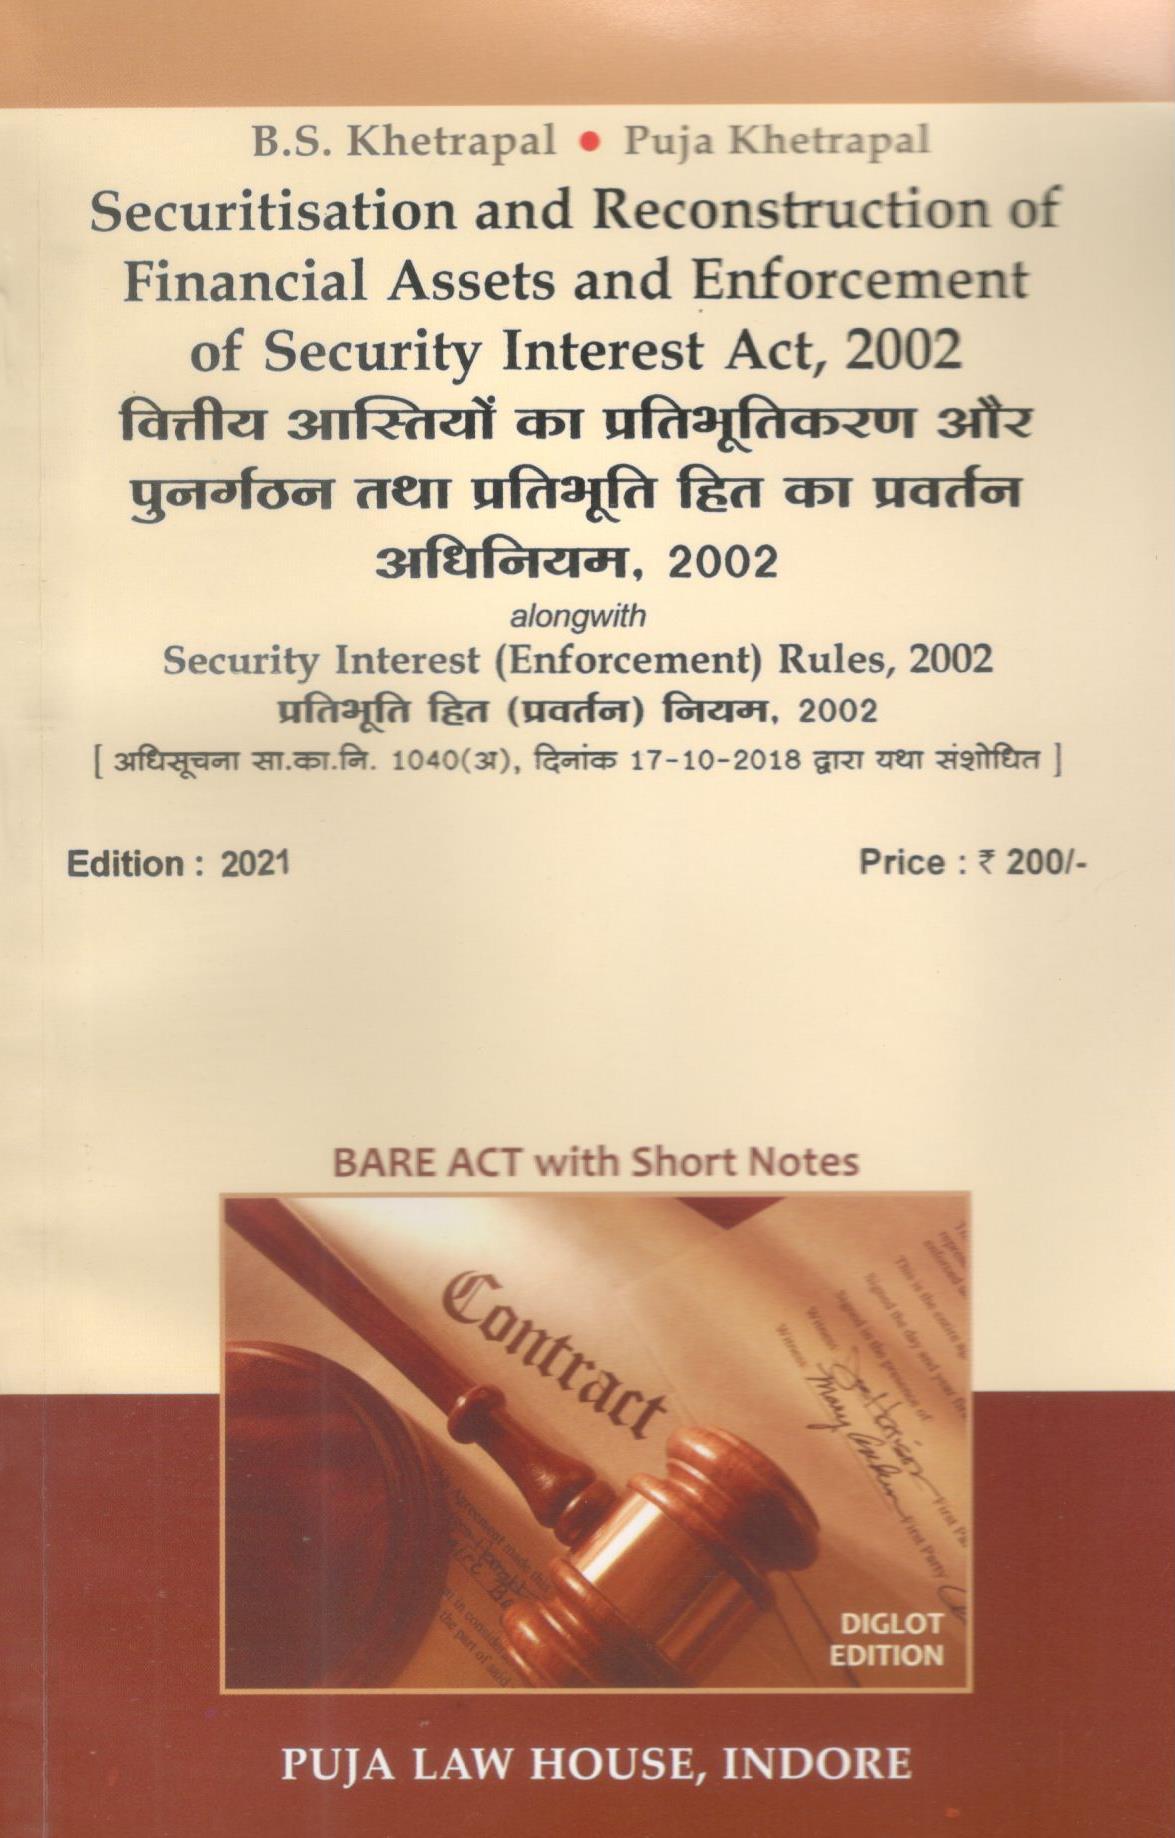 वित्तीय आस्तियों का प्रतिभूतिकरण और पुनर्गठन तथा प्रतिभूति हित का प्रवर्तन अधिनियम, 2002  और नियम / Securitisation & Reconstruction of Financial Assets & Enforcement of Security Interest Act, 2002 & Rules